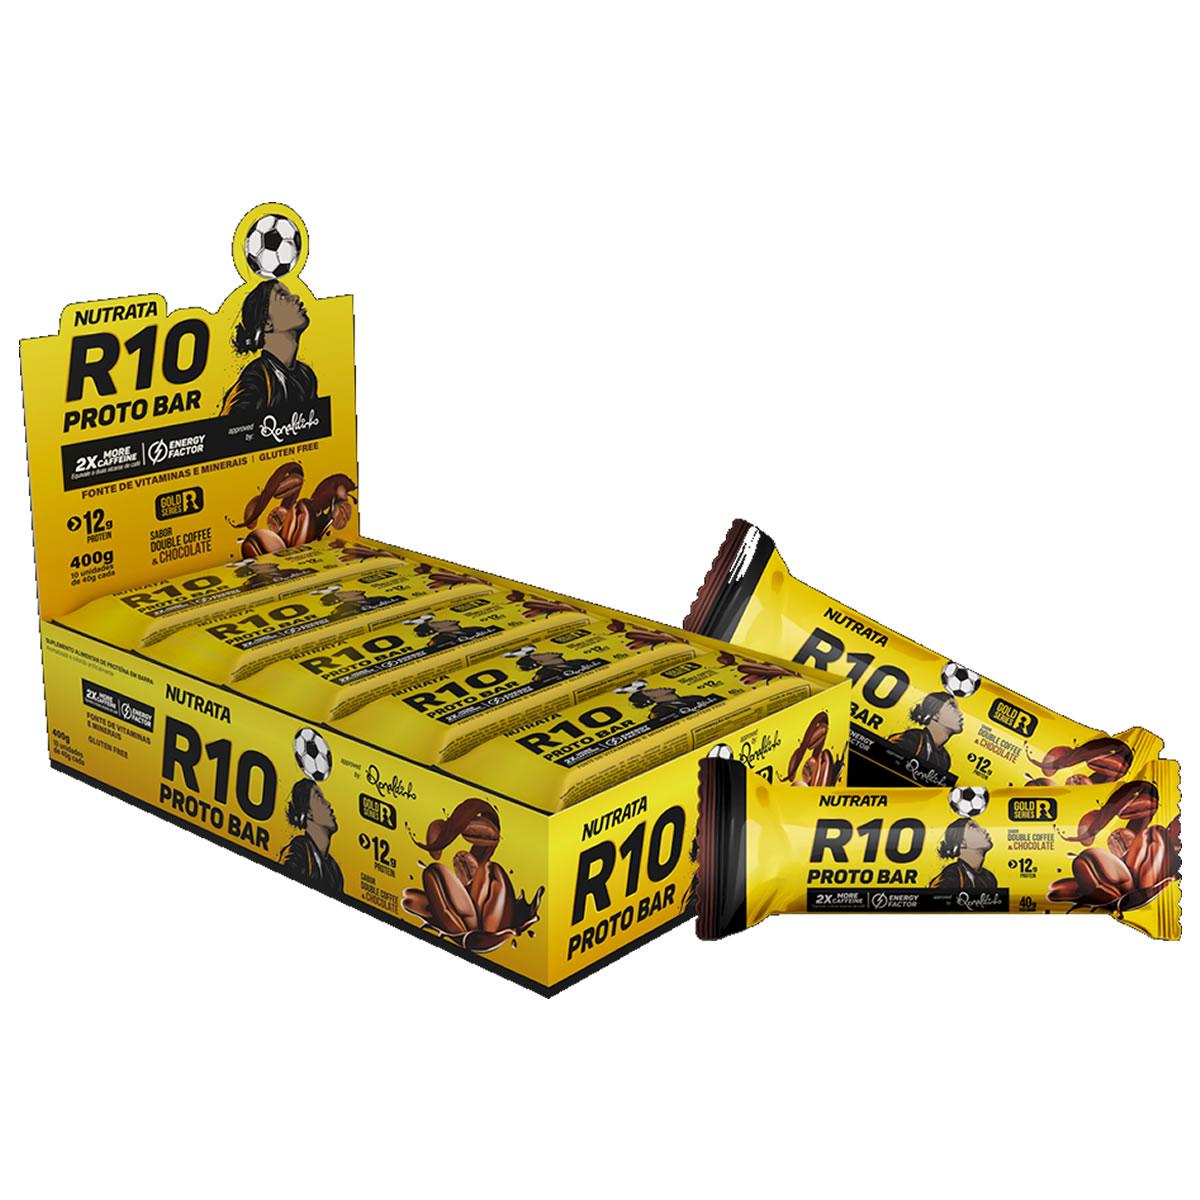 R10 ProtoBar 10 Unidades - Nutrata